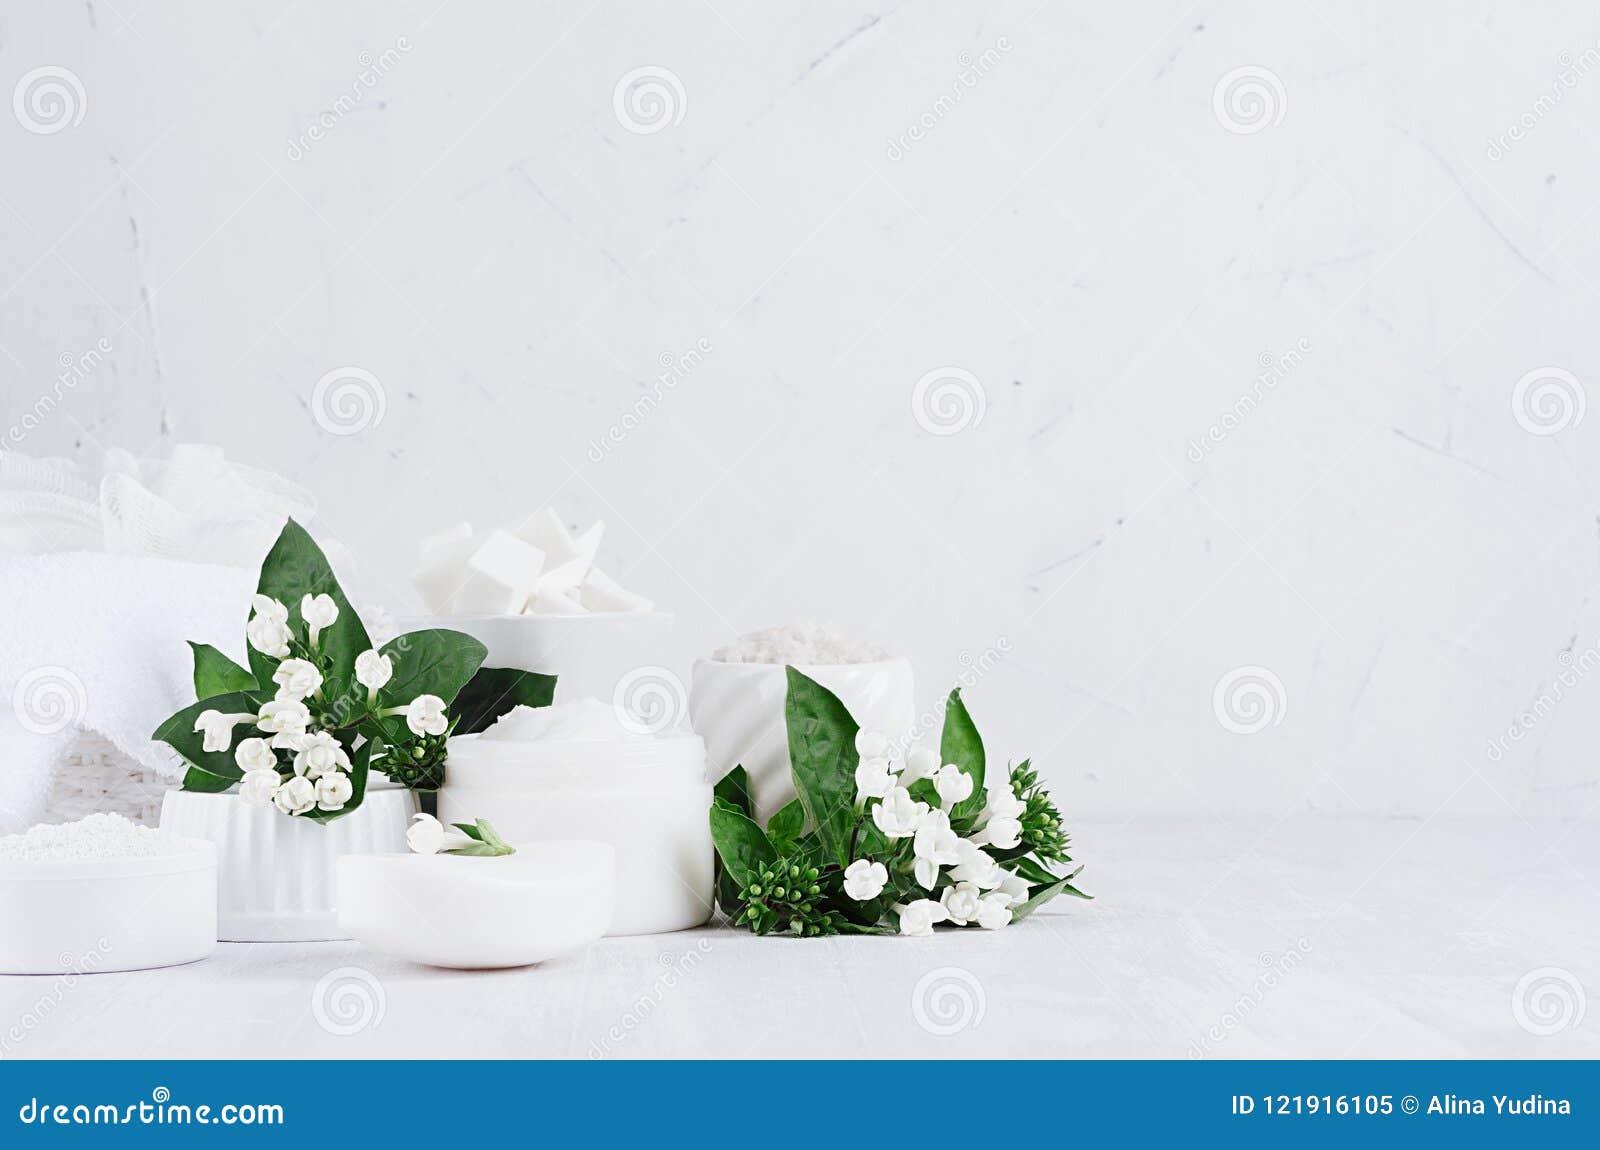 Fresh white natural wedding cosmetics - white cream, salt, clay, towel, bath accessories, flowers on soft light white wood table.